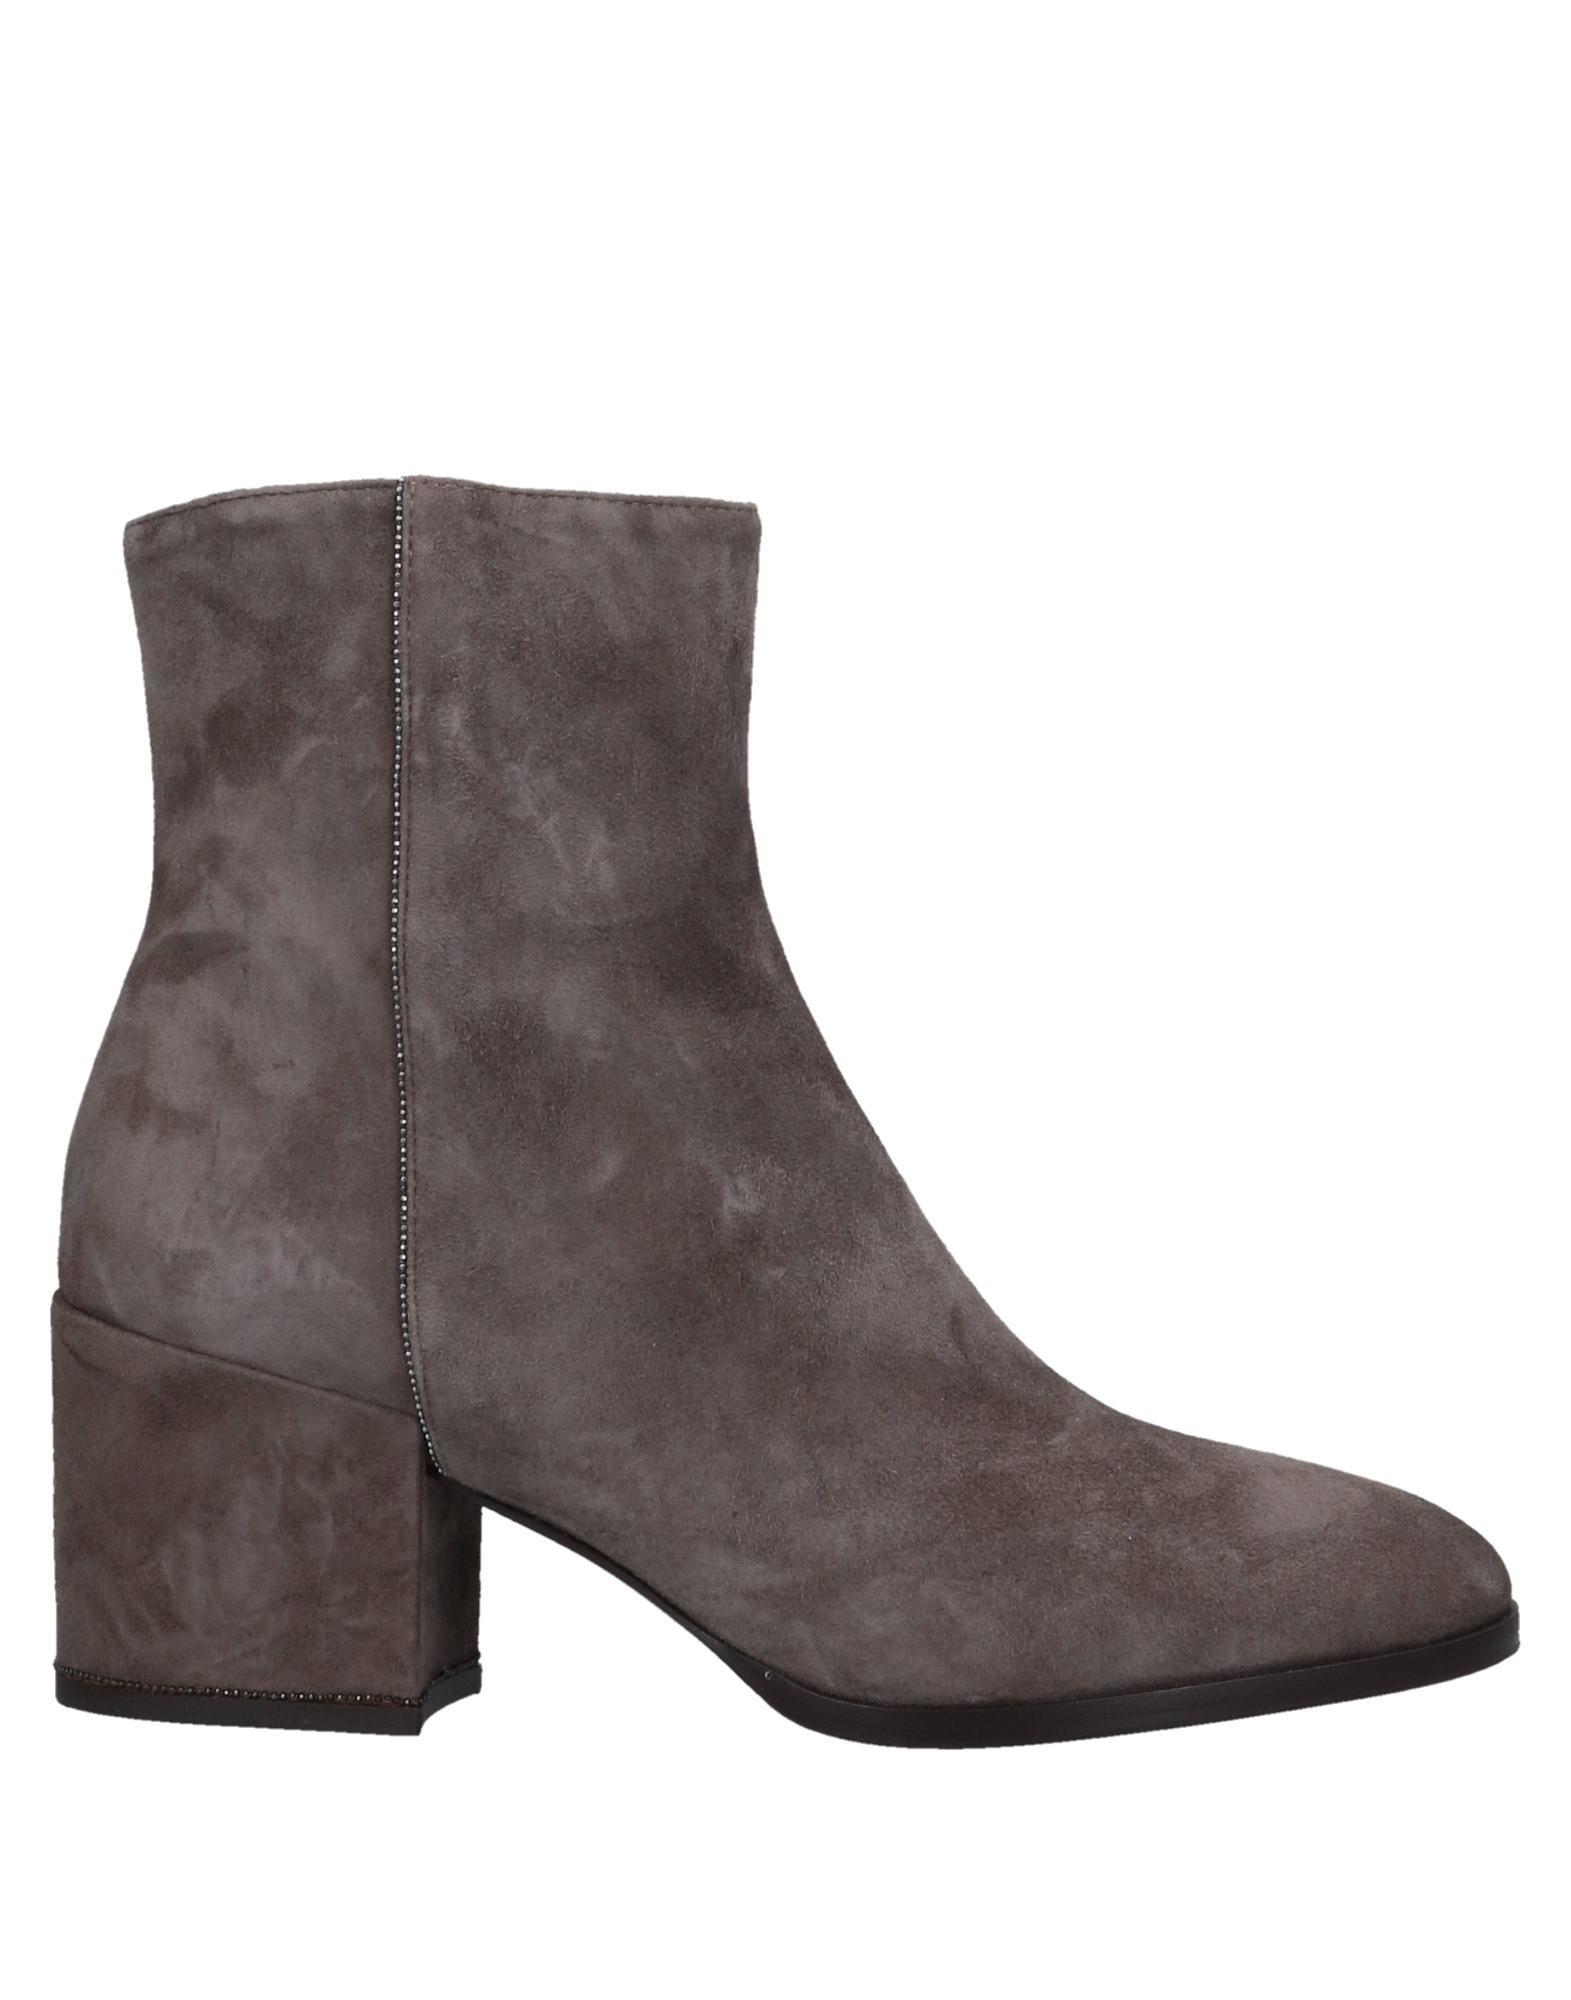 Fabiana Filippi Stiefelette Damen  11530539NKGünstige gut aussehende Schuhe